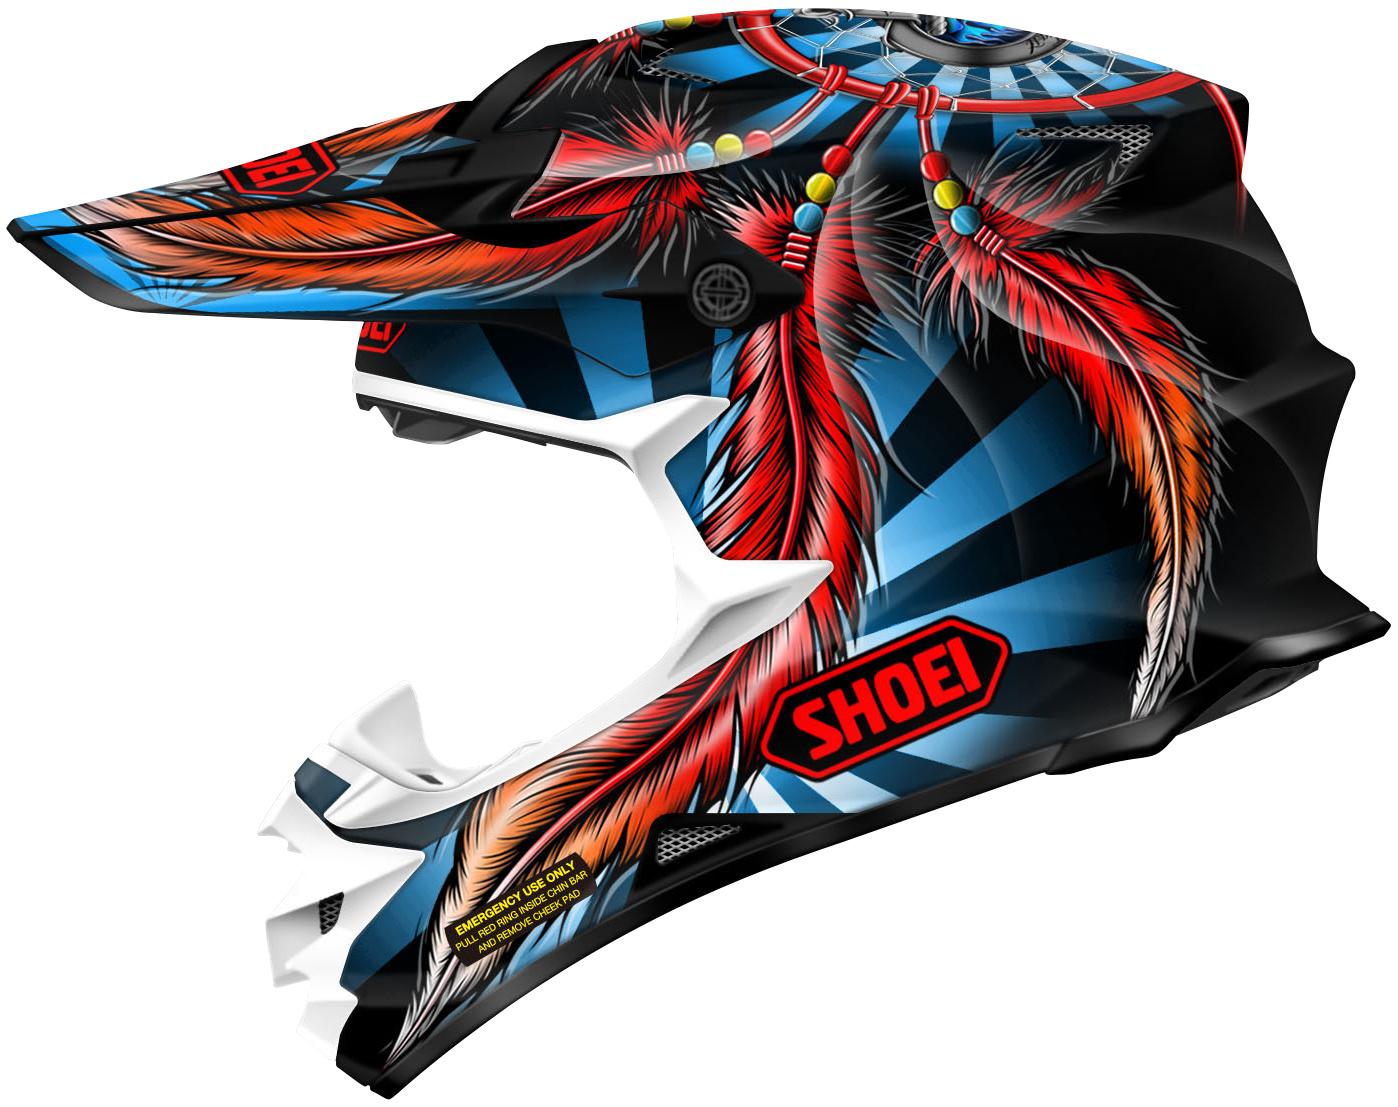 shoei vfx w grant 2 off road moto helmet closeout ebay. Black Bedroom Furniture Sets. Home Design Ideas